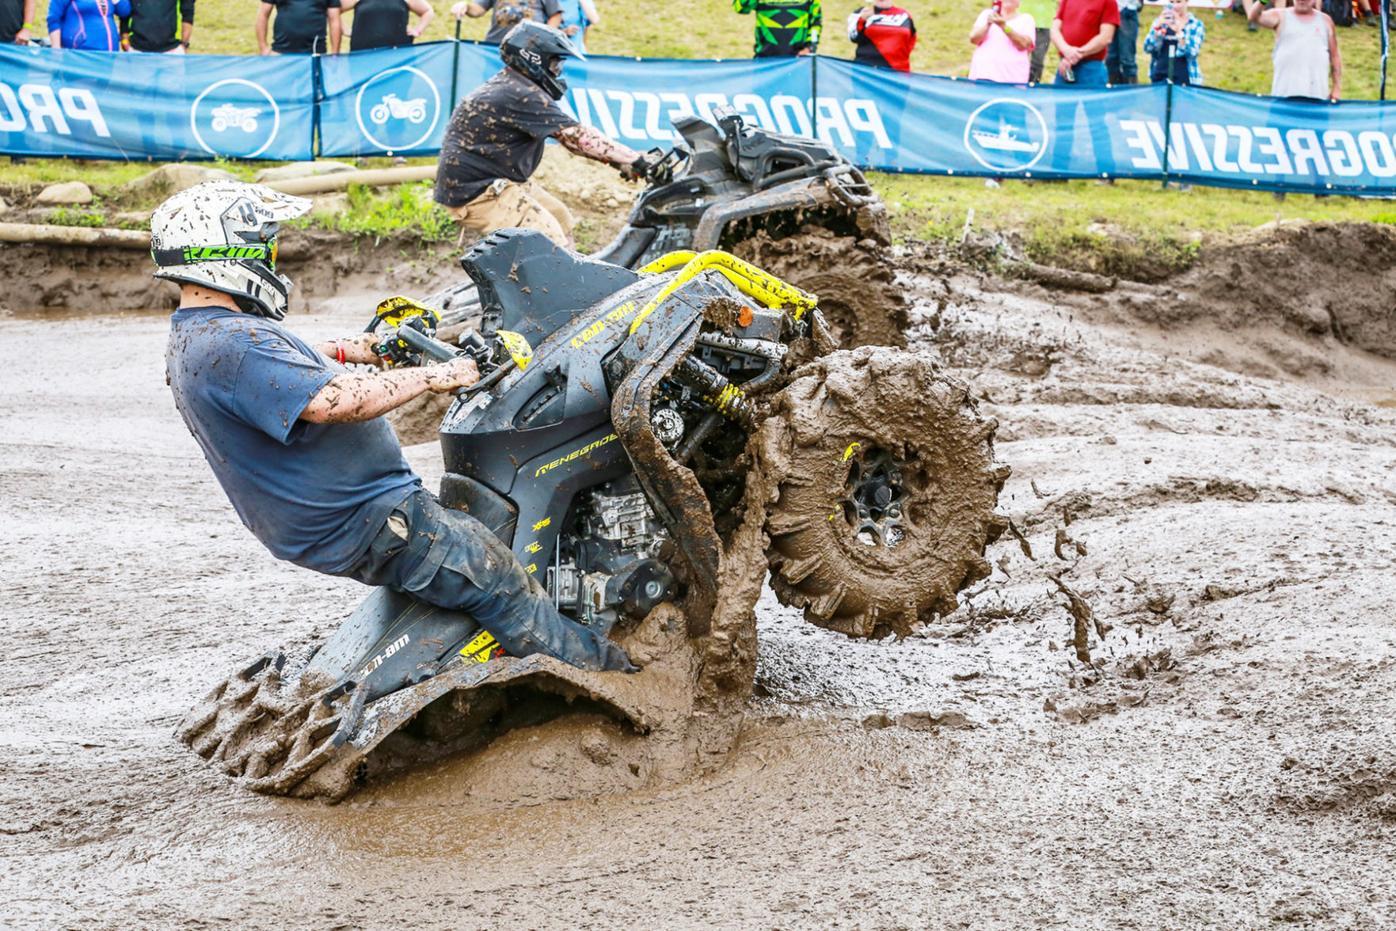 Muddy course